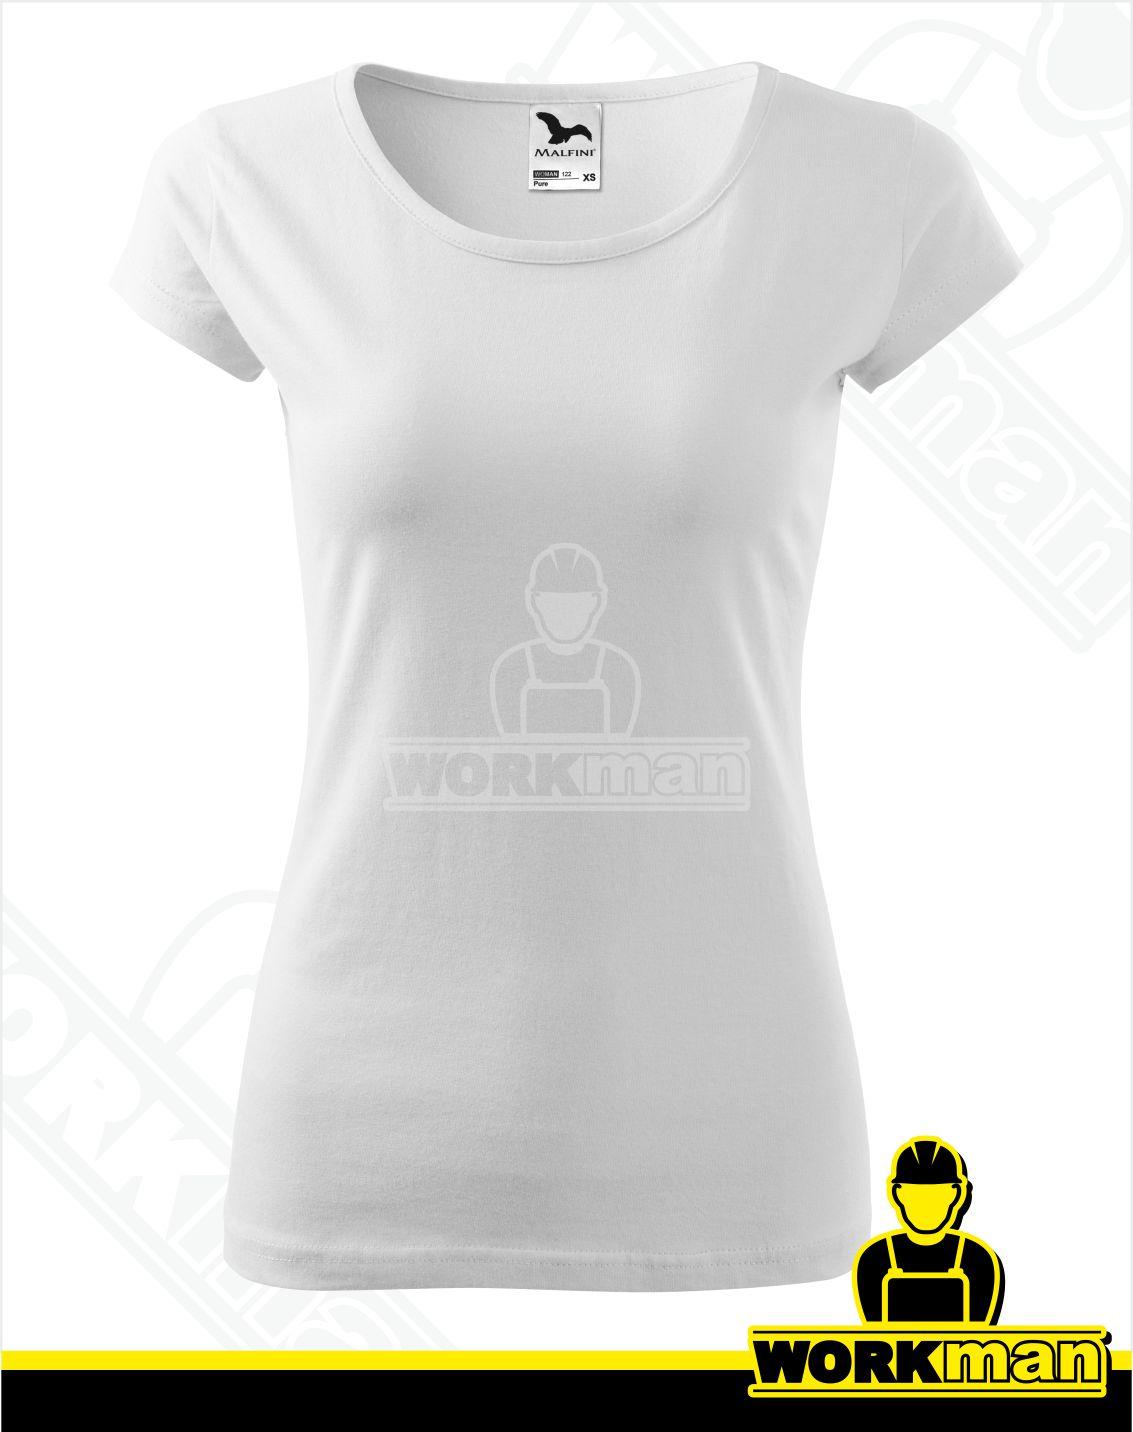 9f4a5acdc5b1a Dámske tričko PURE Malfini Pracovné odevy Workman